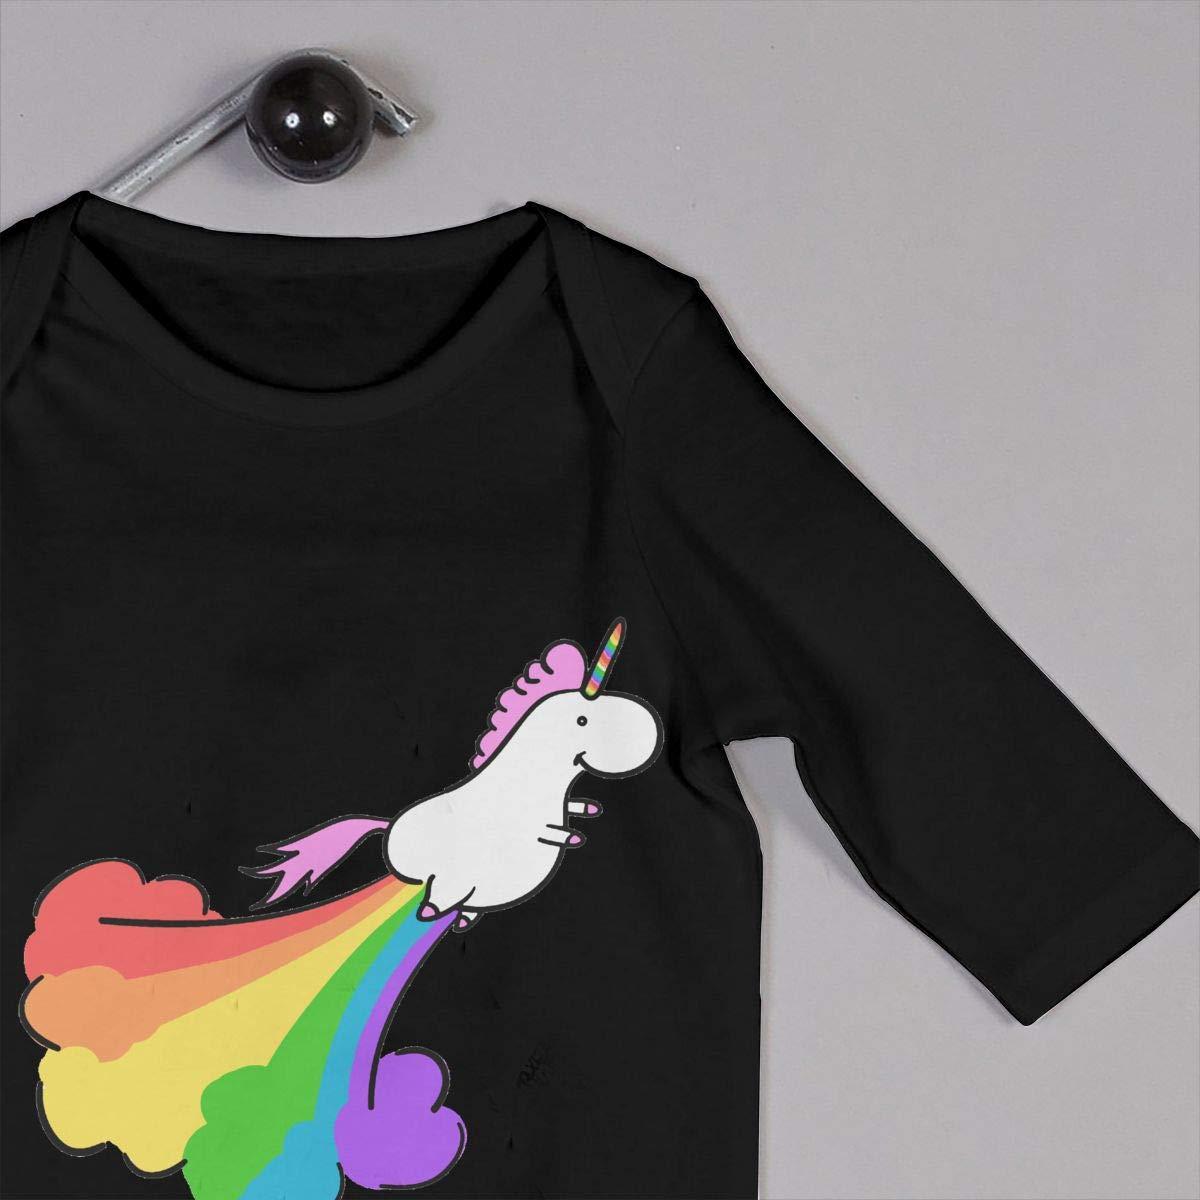 Fart Rainbow Unicorn Unisex Baby Bodysuit Onesie Baby Clothes